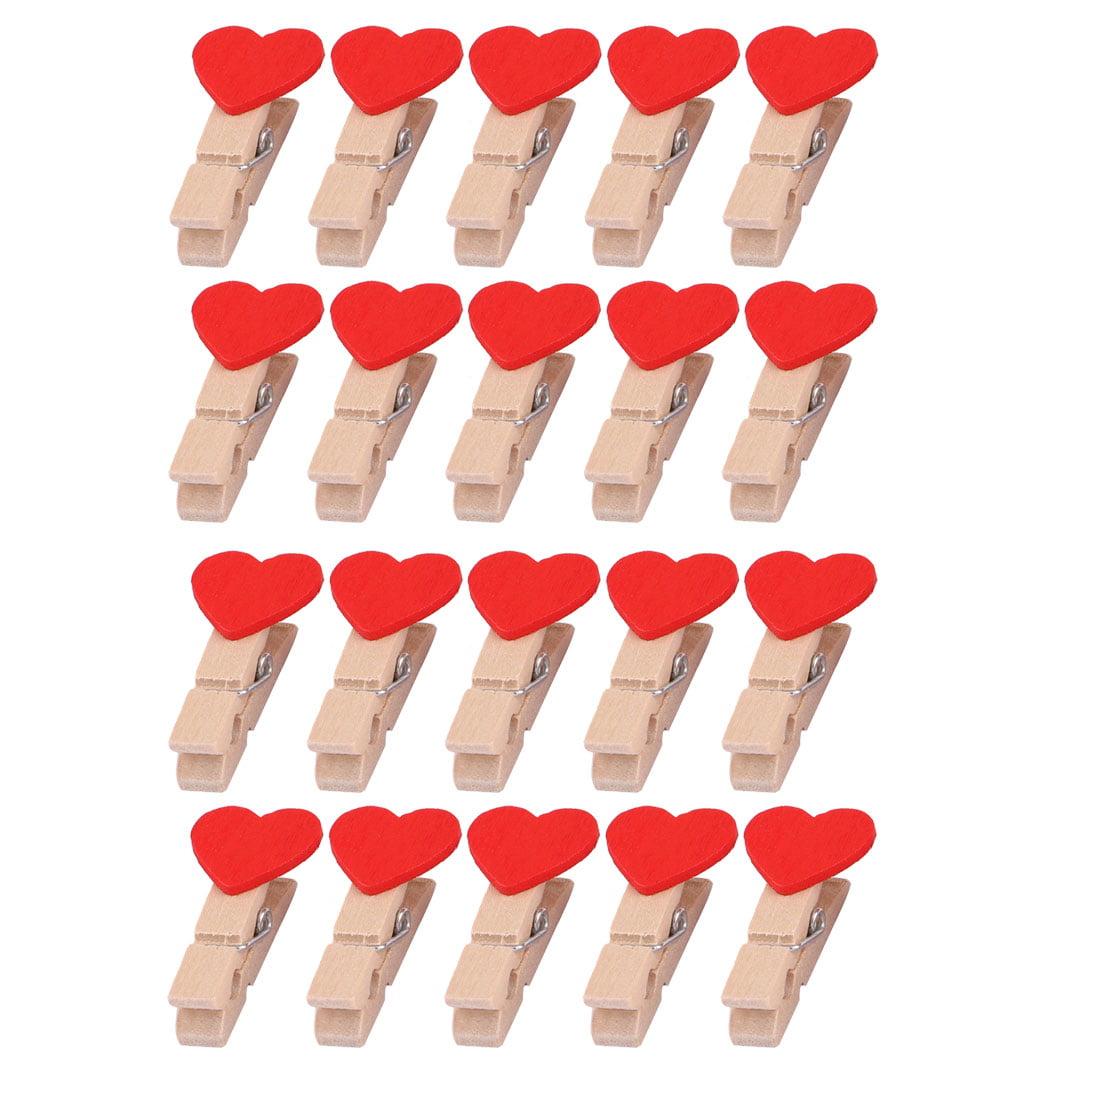 Wooden Love Heart Decor DIY Photo Card Scrapbooks Hanging Hanger Clip Red 20pcs